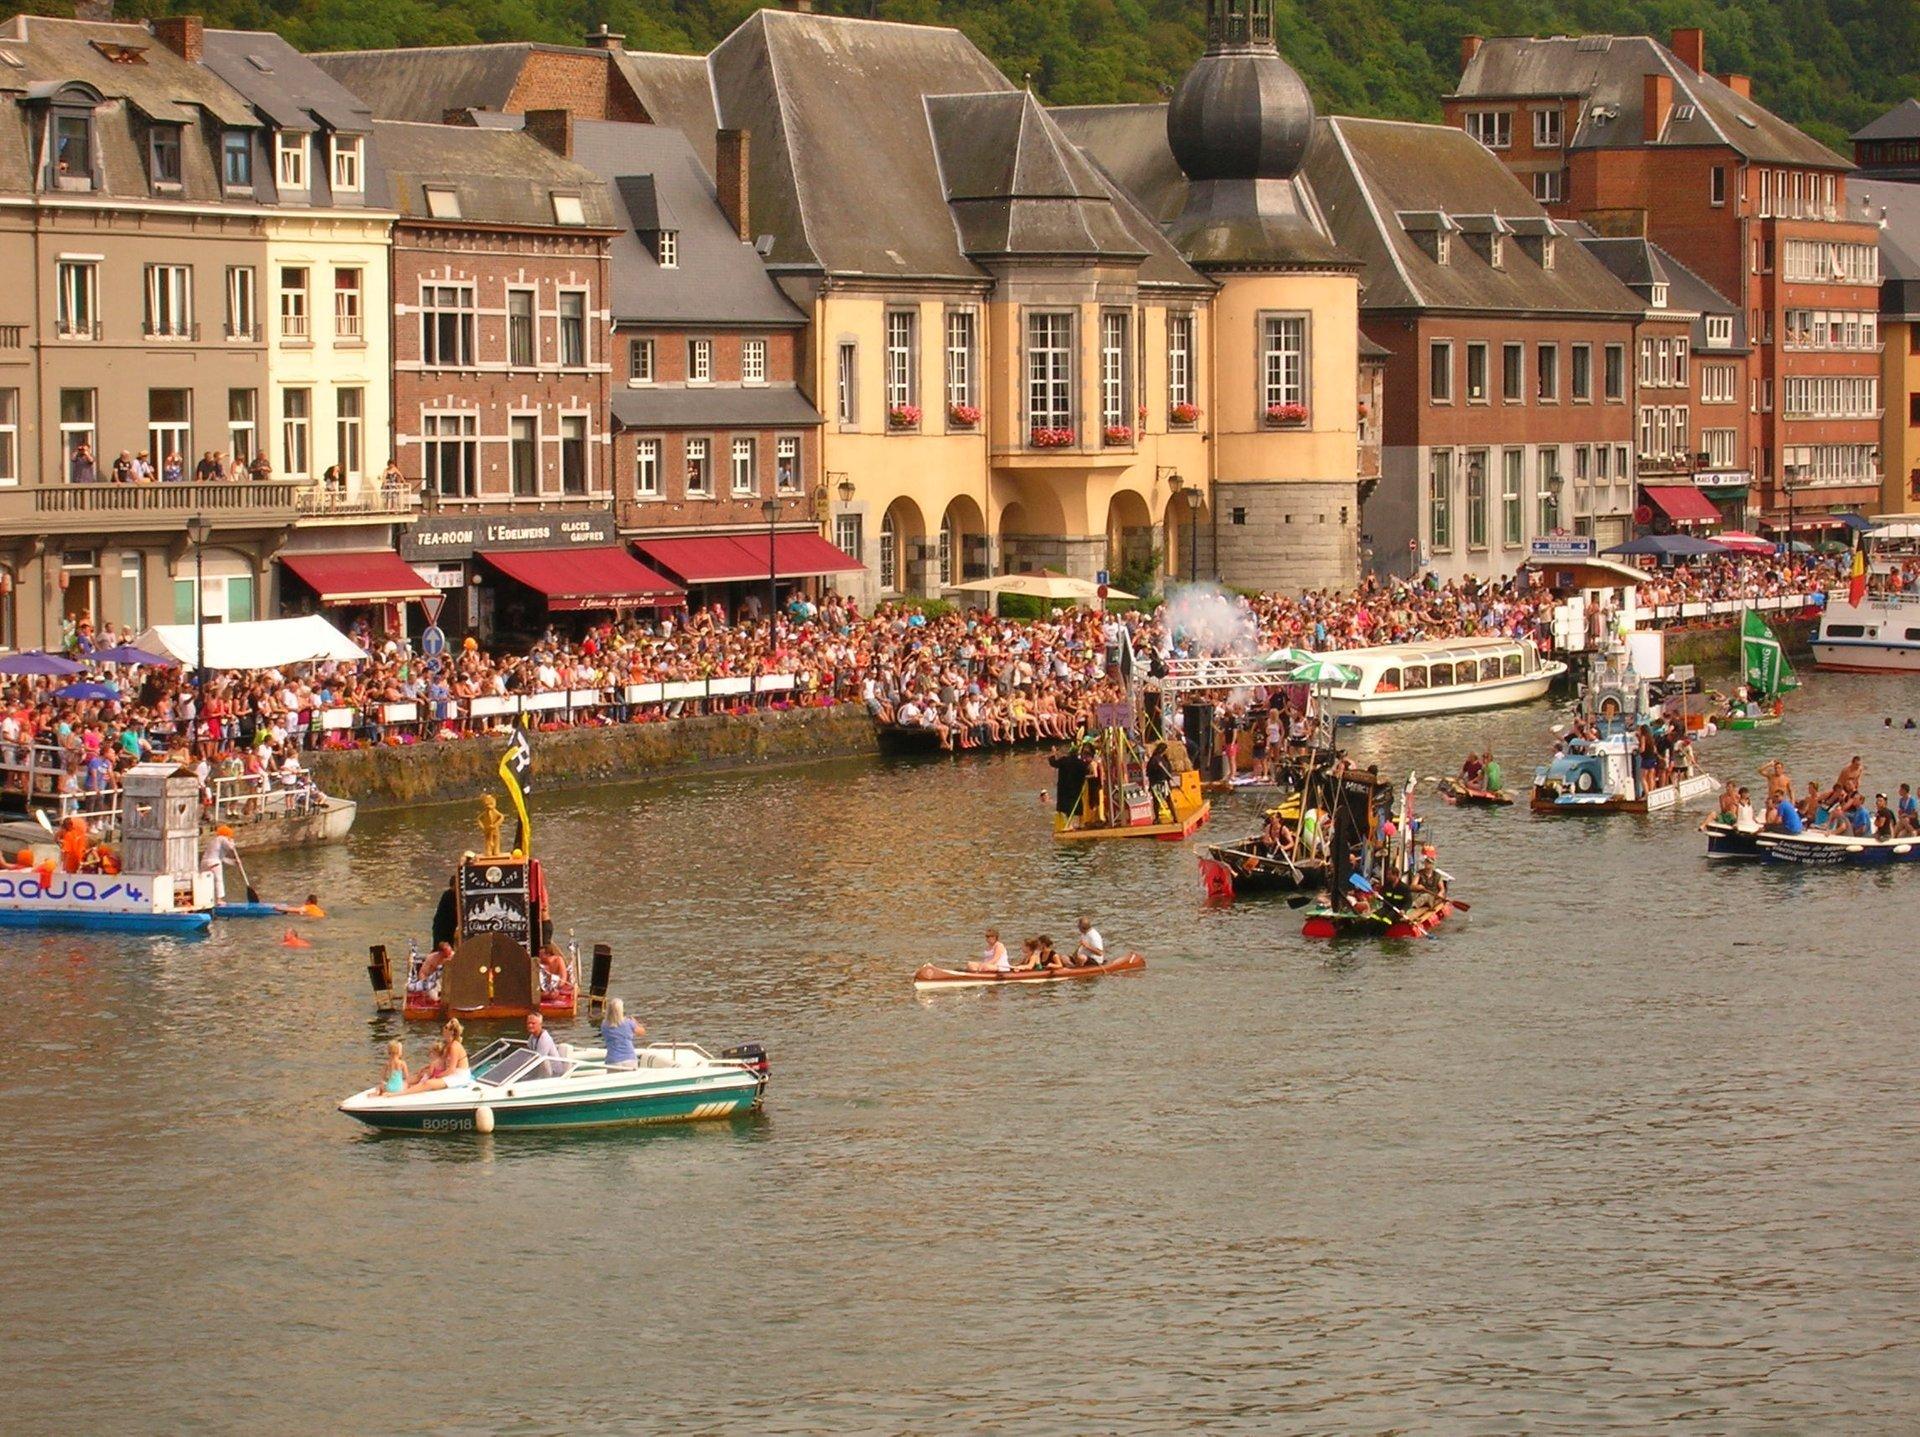 Dinant International Bathtub Regatta in Belgium 2020 - Best Time